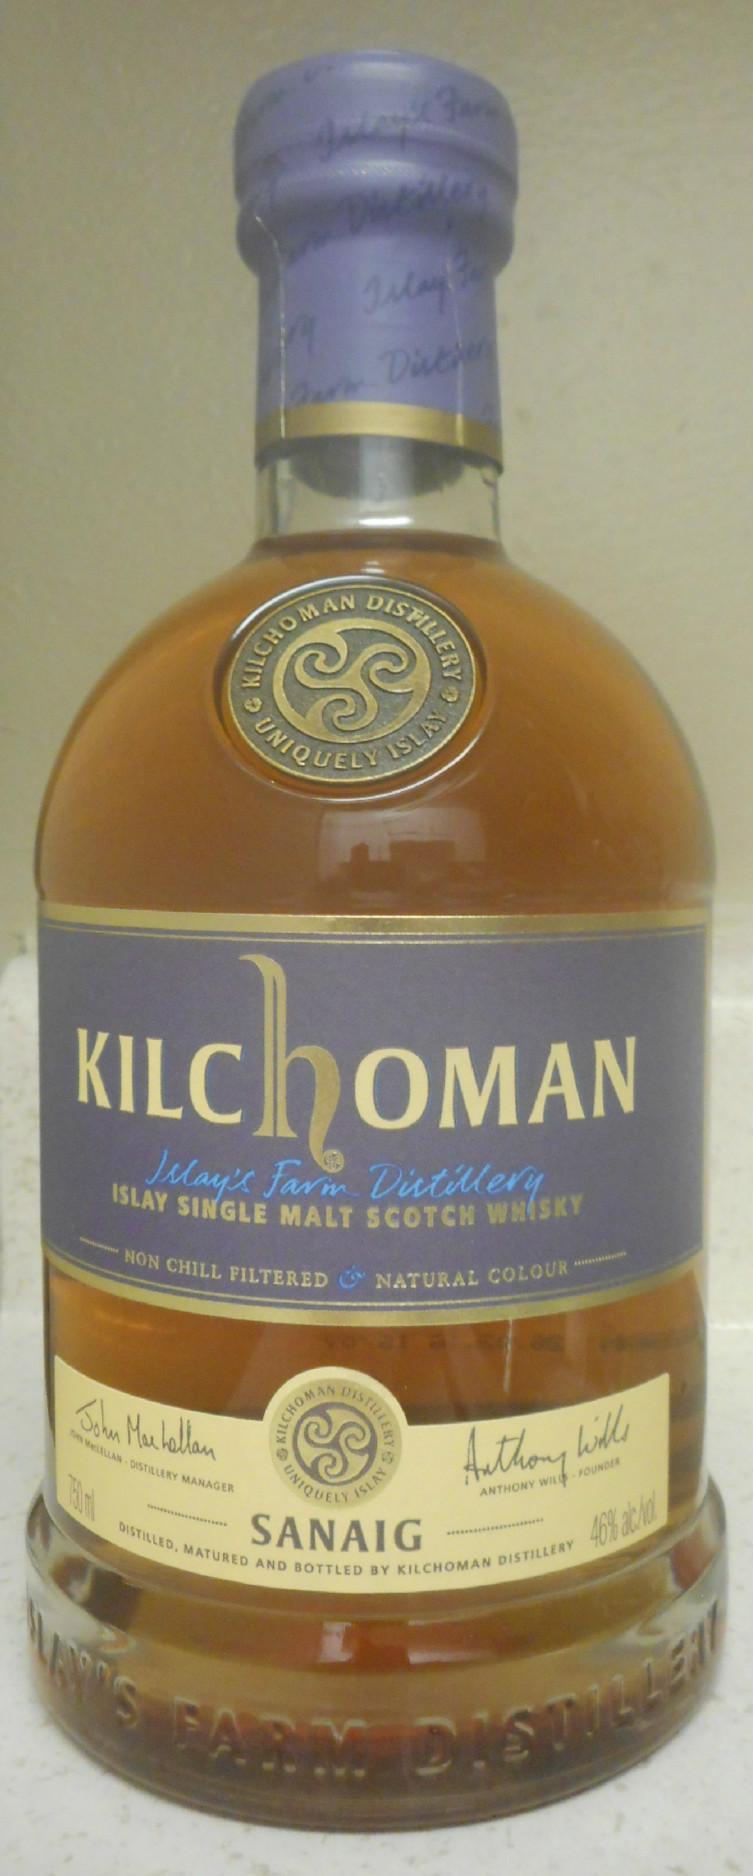 kilchoman-sanaig-2016.jpg